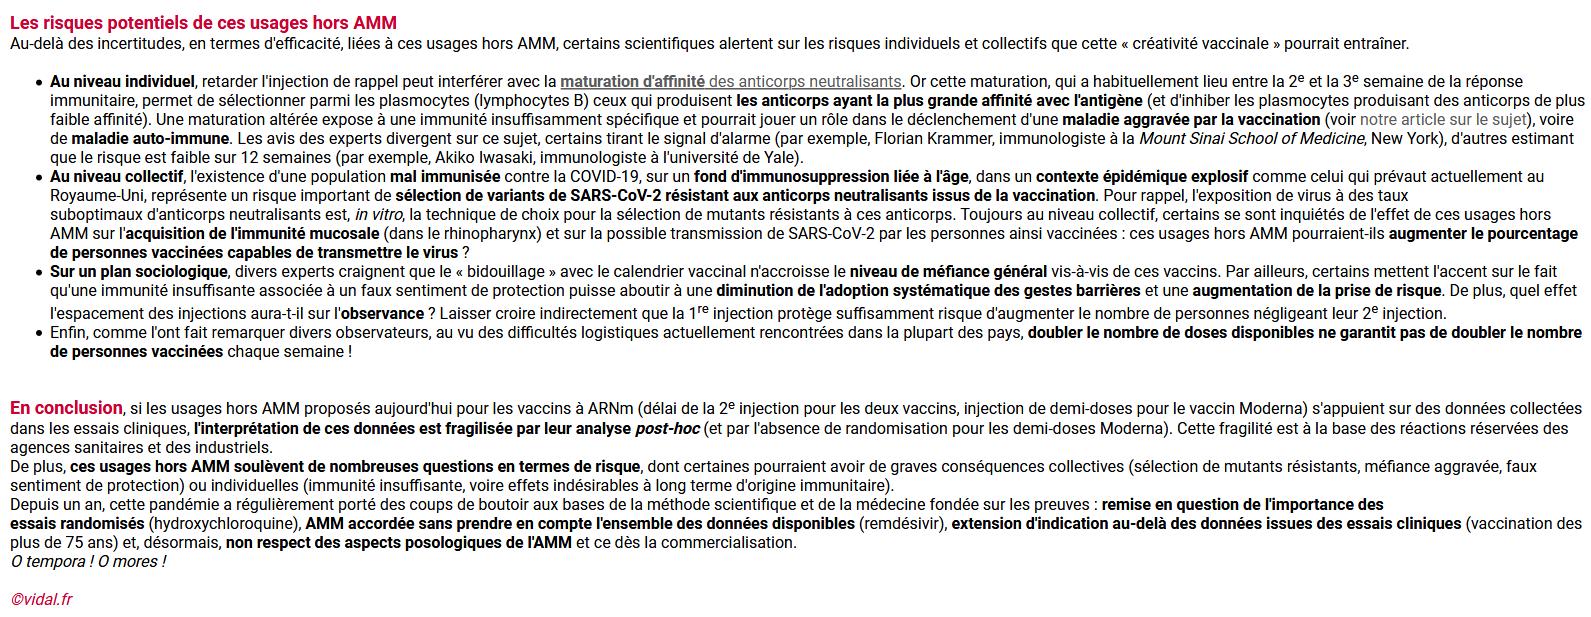 Screenshot_2021-01-08 COVID19 vaccinuri vânt de creativitate în programul de vaccinare .png